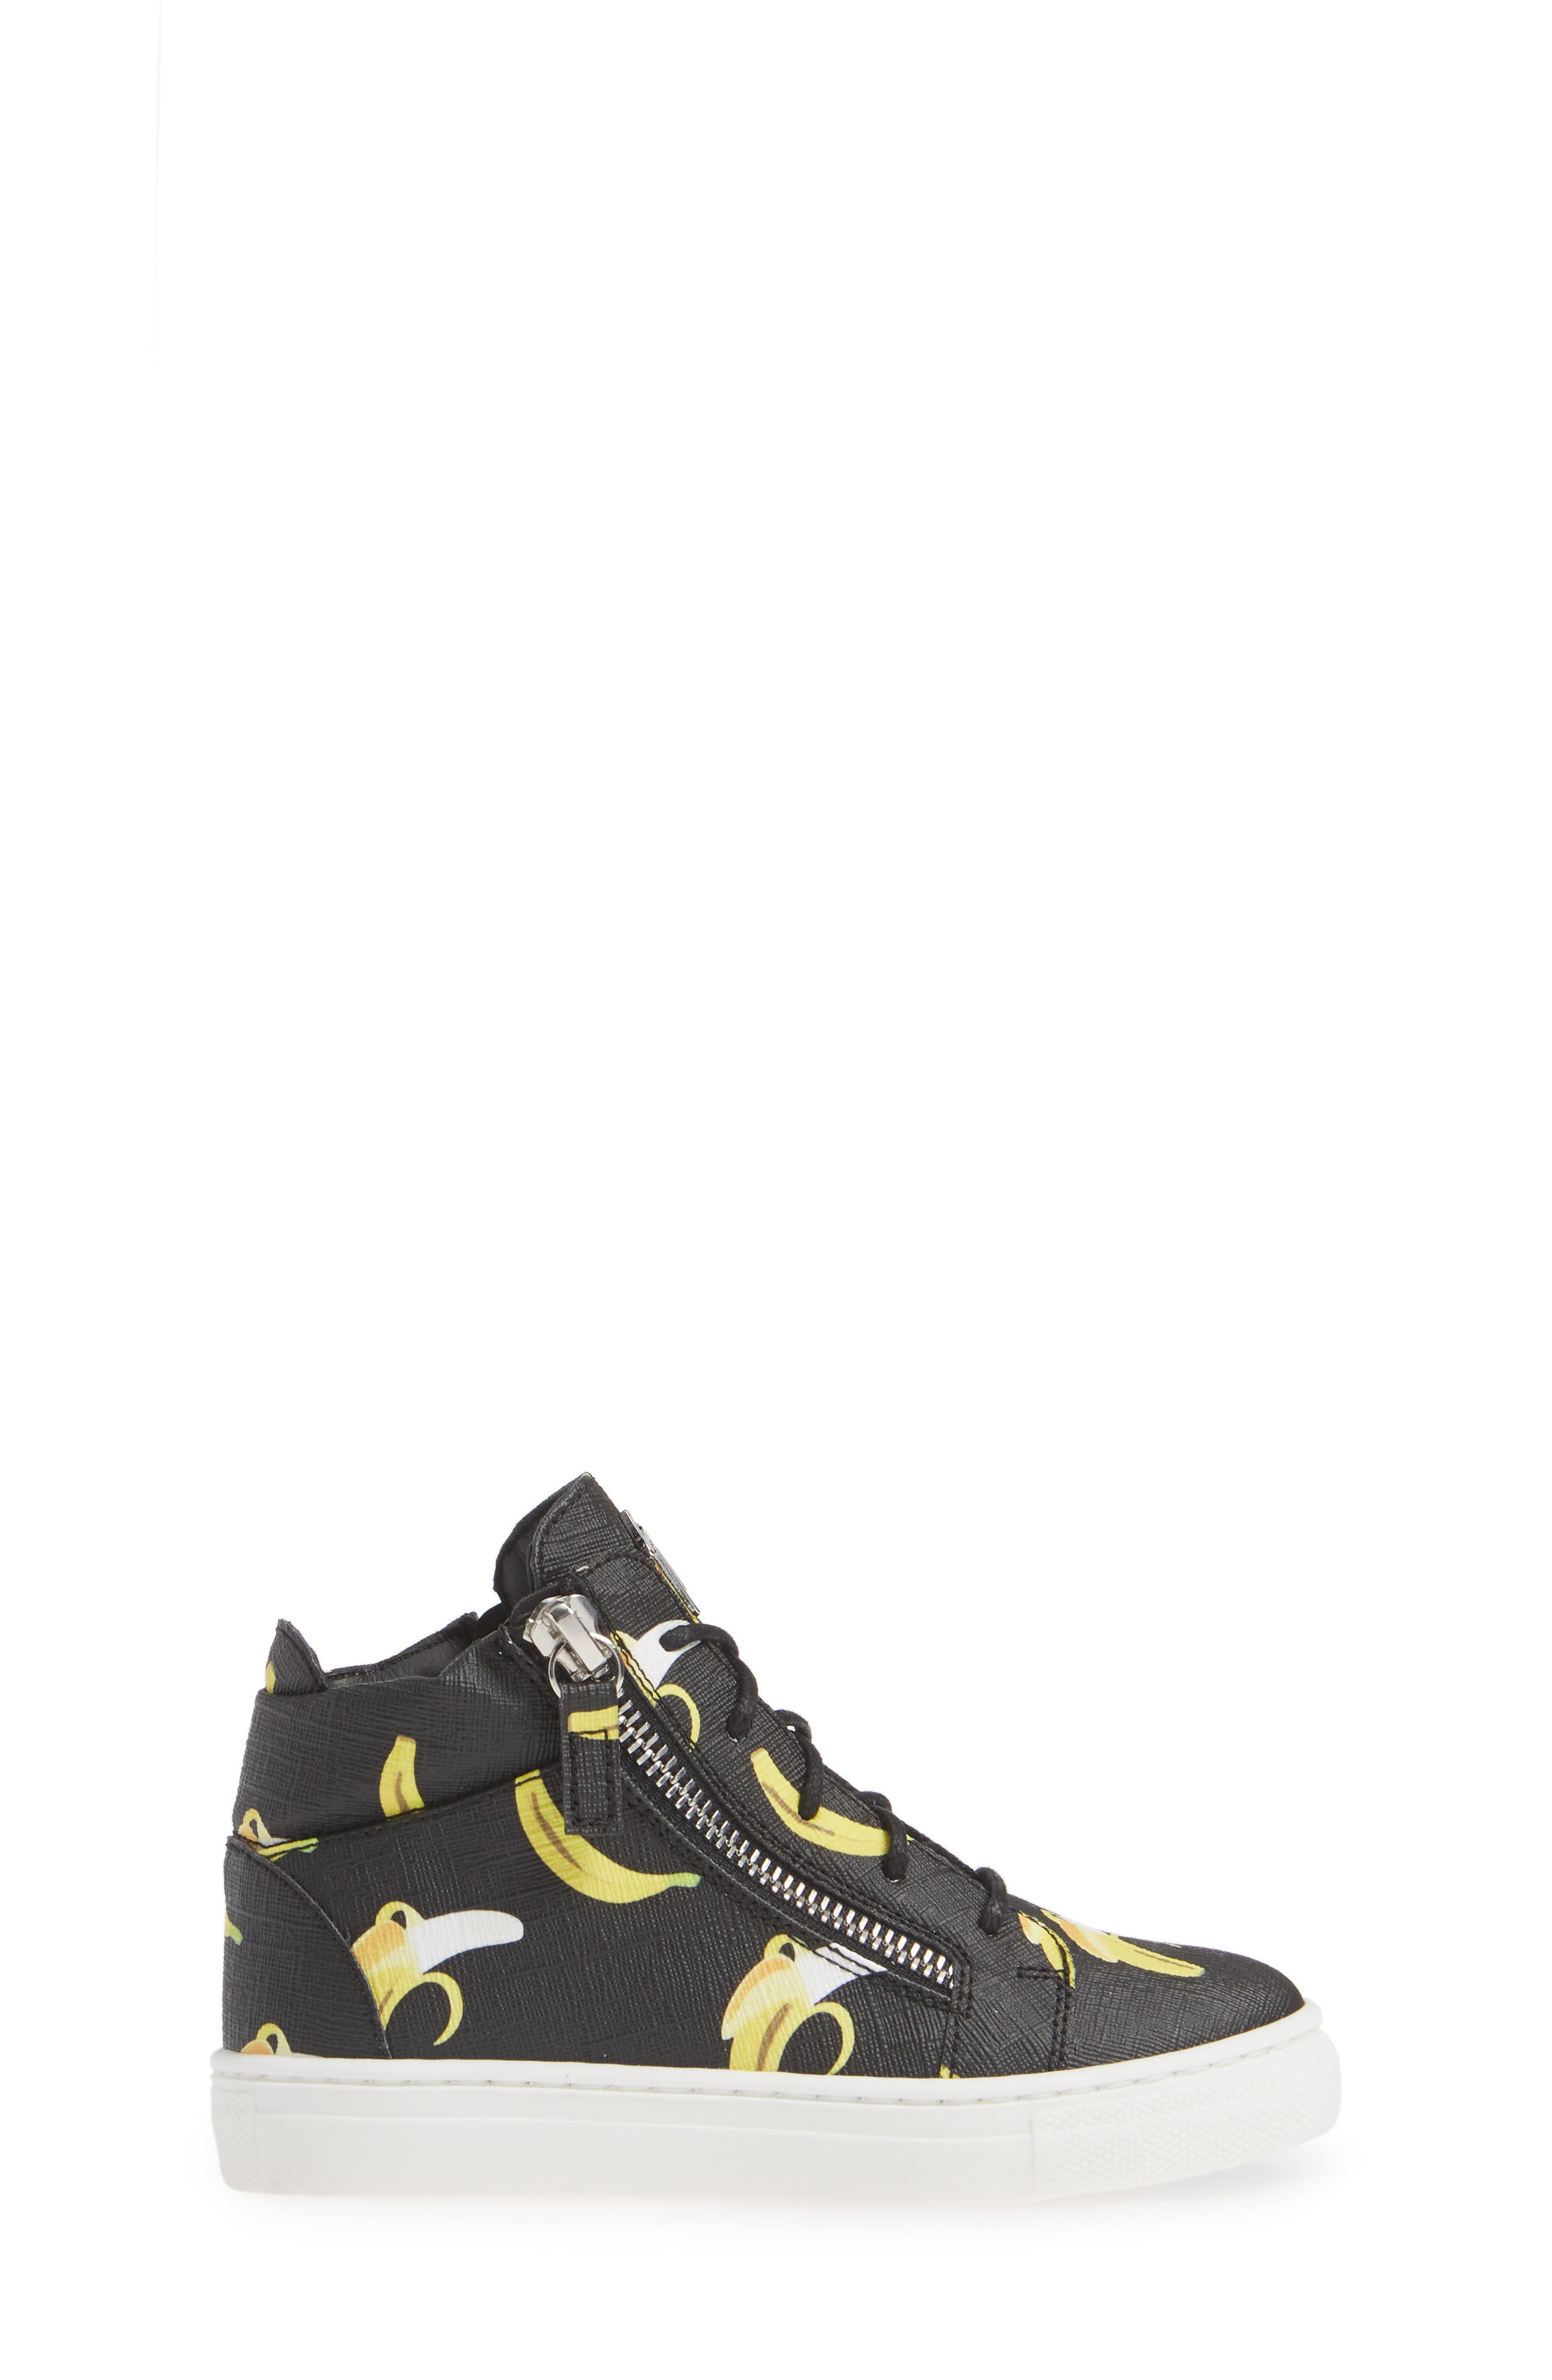 GIUSEPPE ZANOTTI, Kidlondon Banana Print Sneaker, Alternate thumbnail 3, color, BANANAS